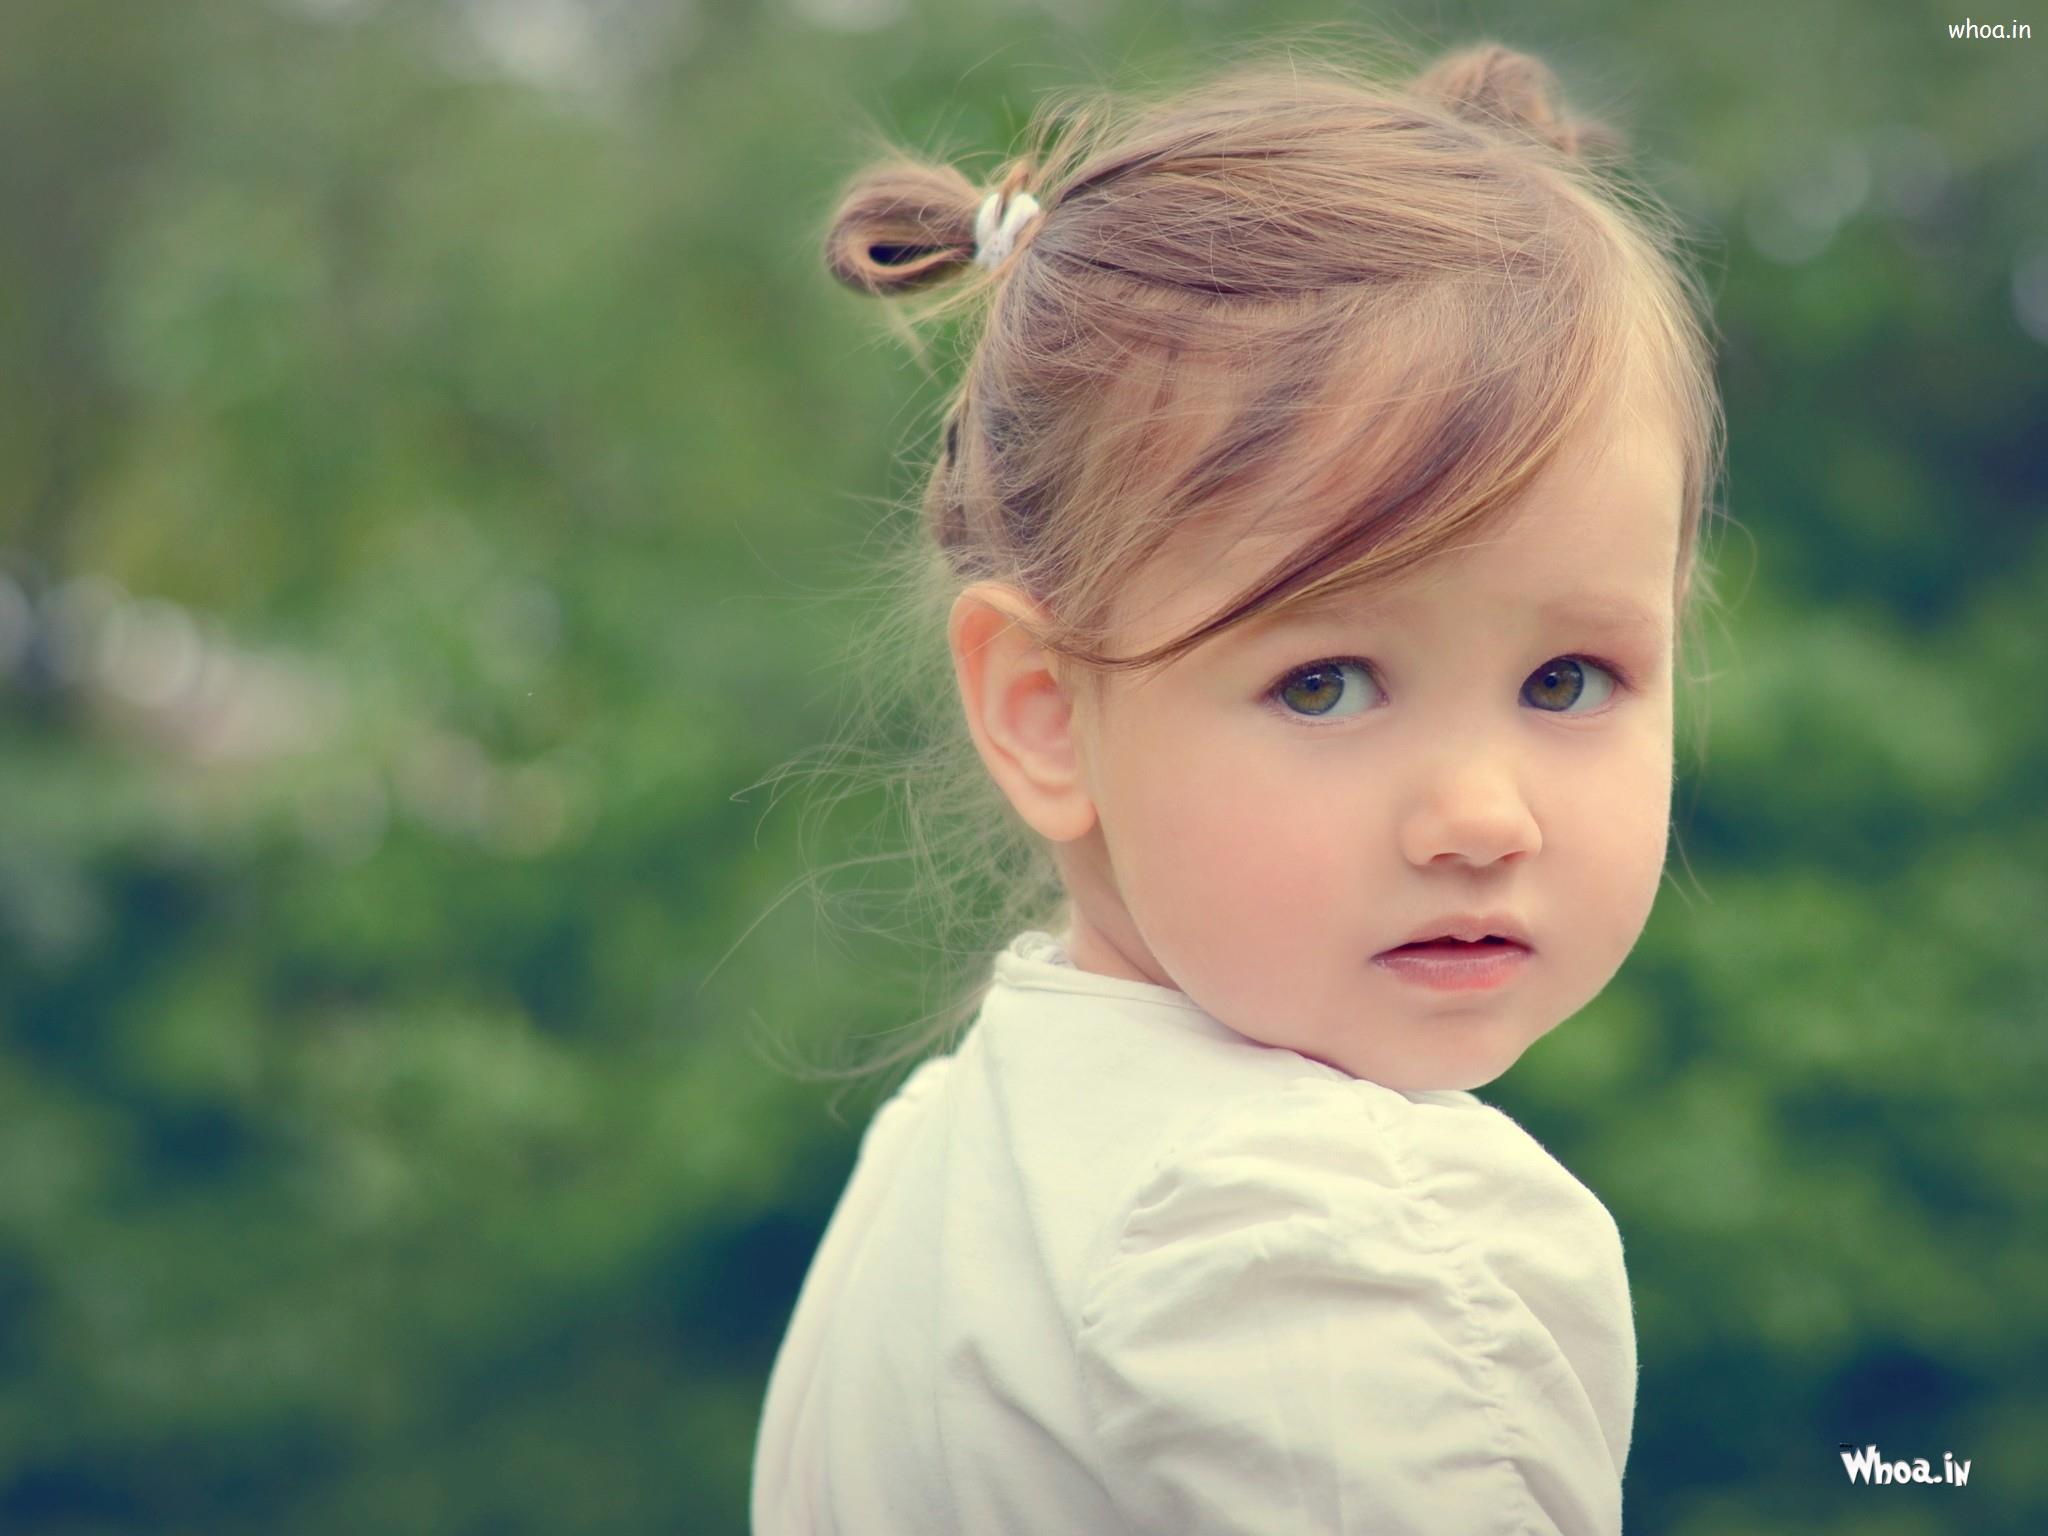 Cute Baby Girl Black Eyes With Face Closeup Hd Cute Baby Wallpaper